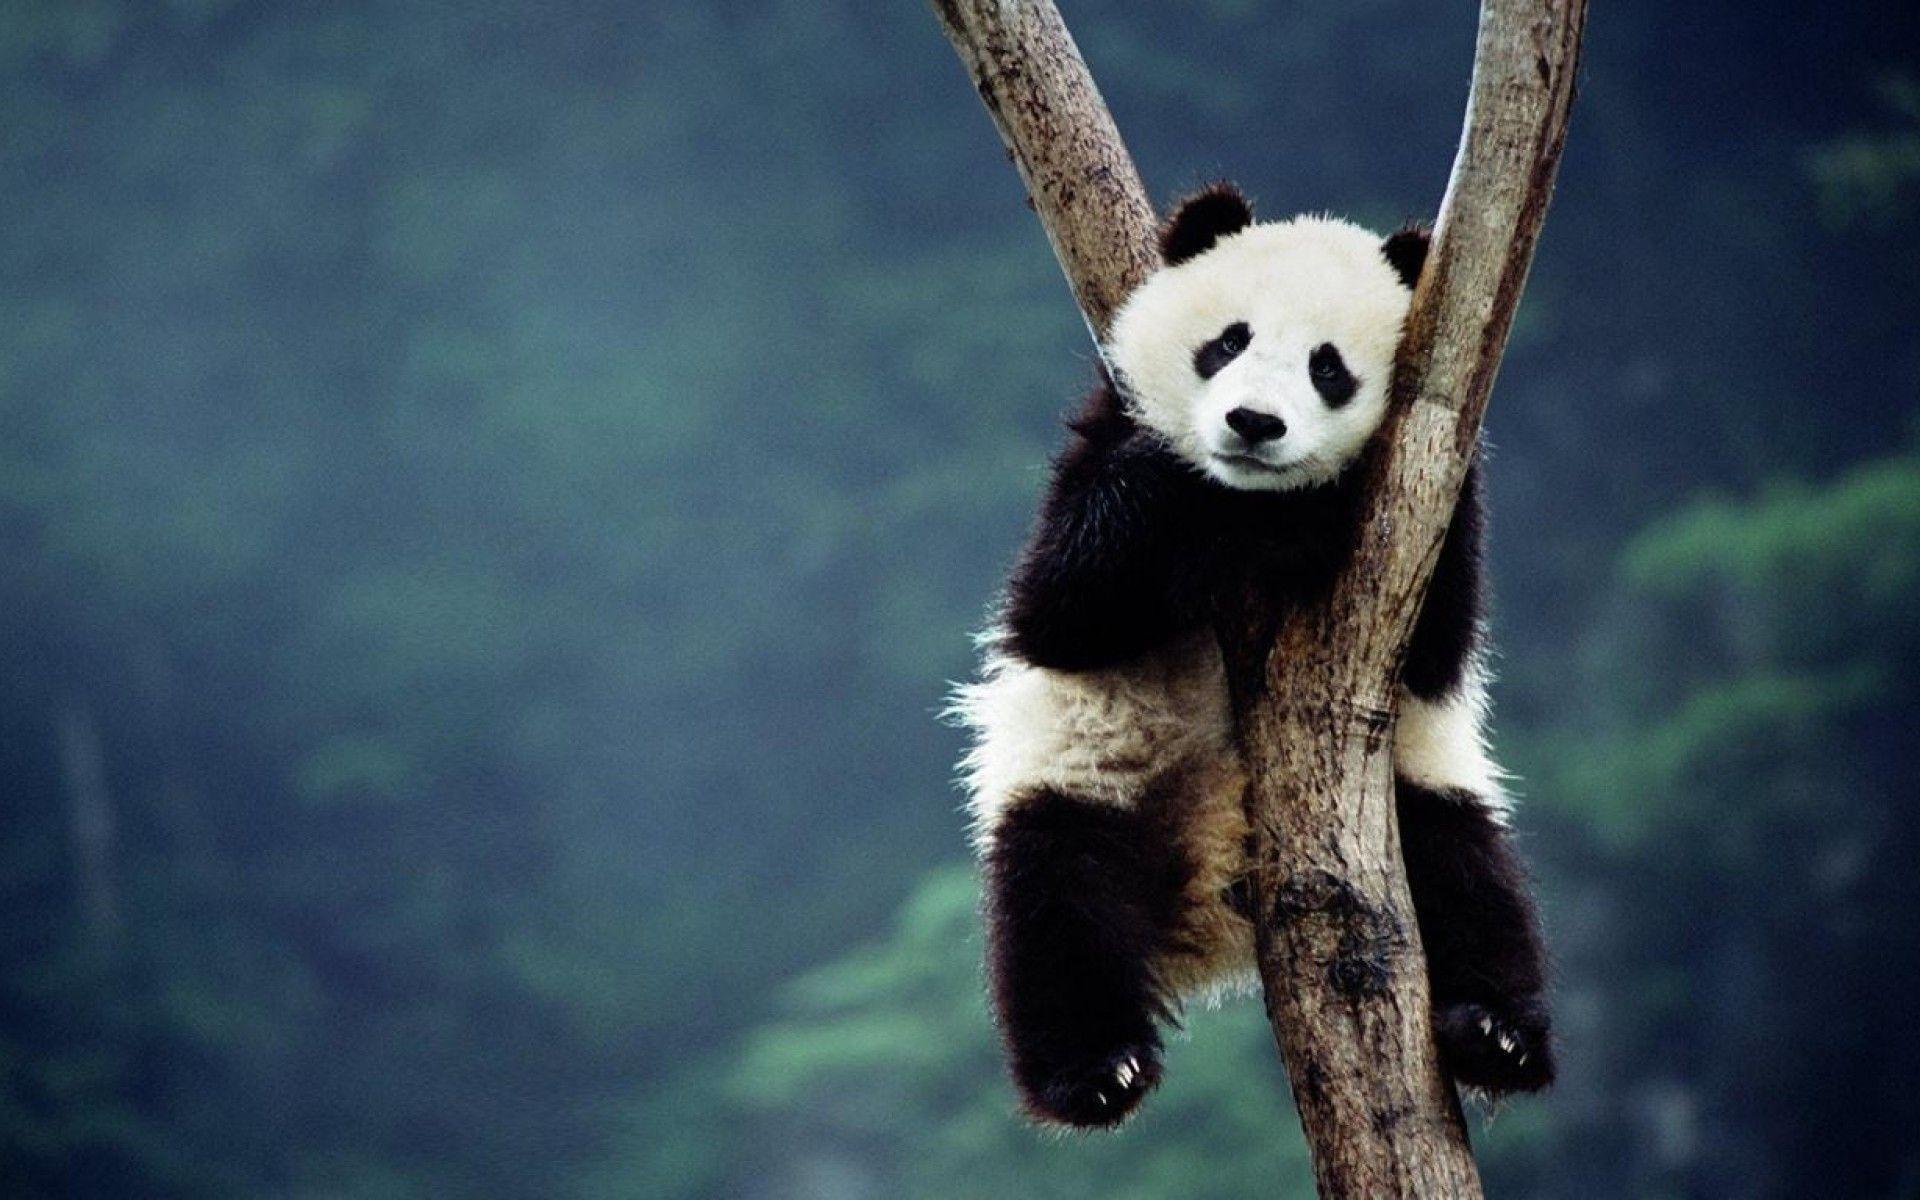 AmazingPict.com | Cute Panda Bears Wallpaper High Resolution